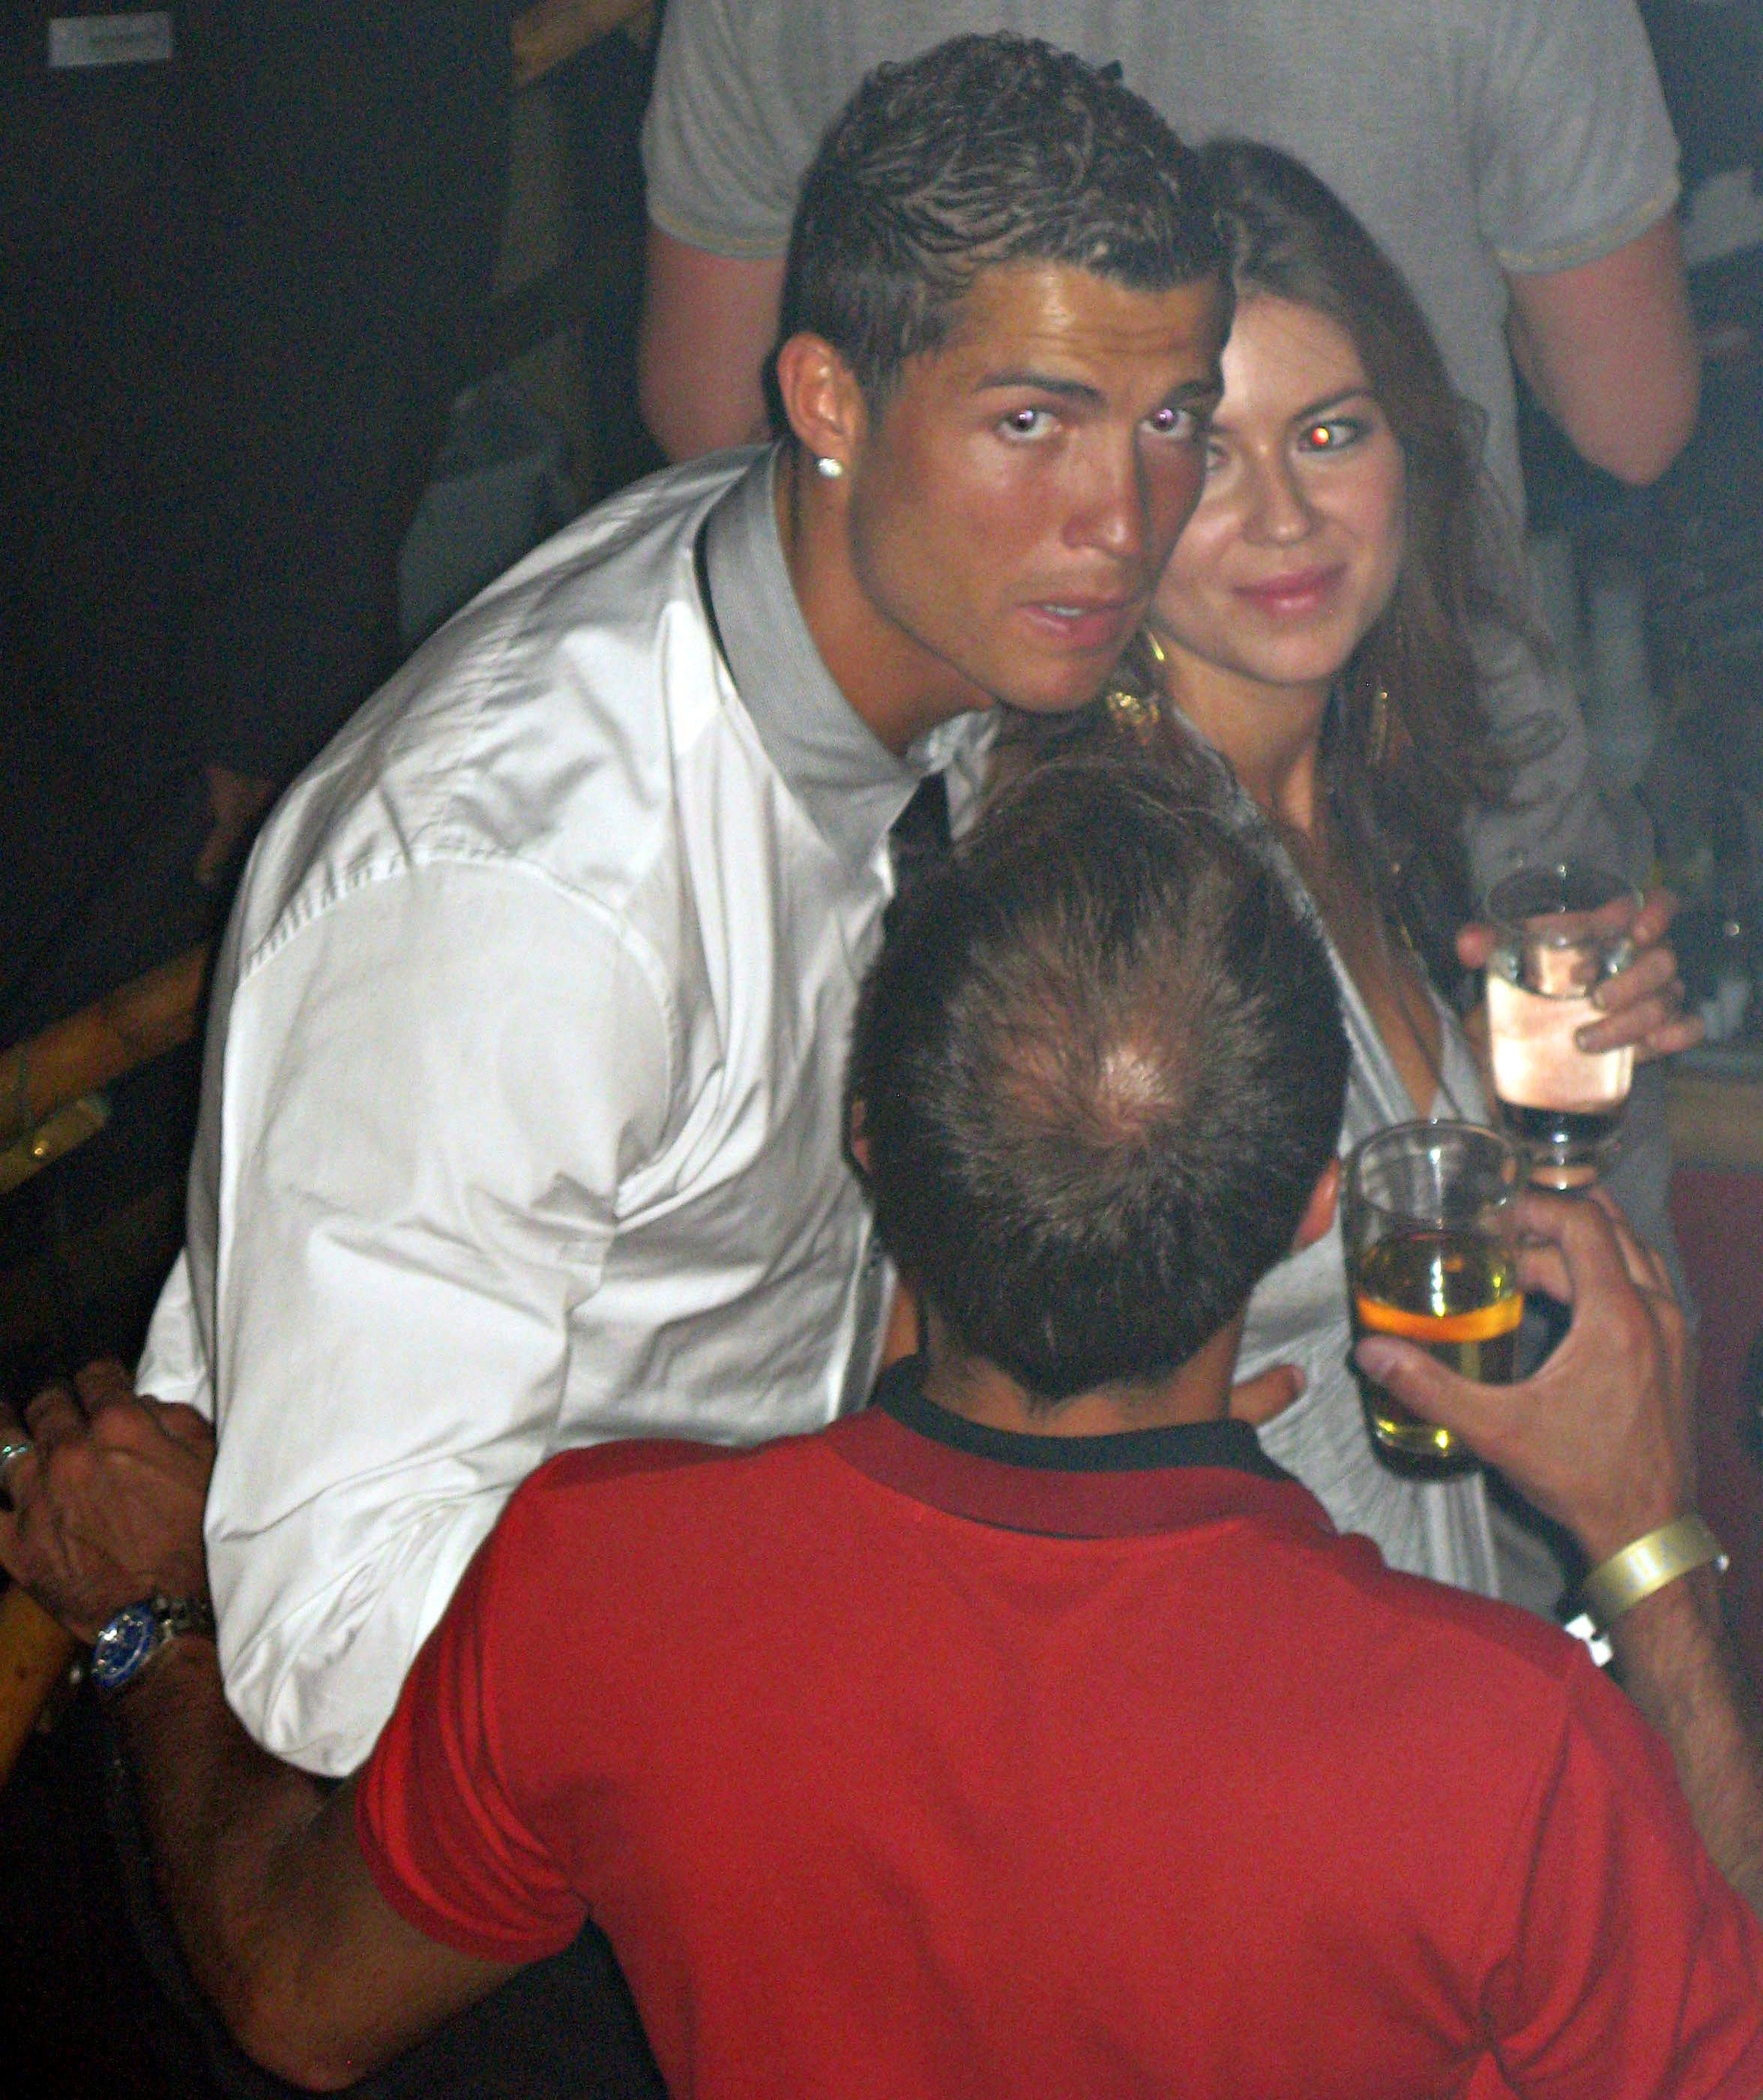 Cristiano Ronaldo Attorneys Say Rape Accusation Documents Were